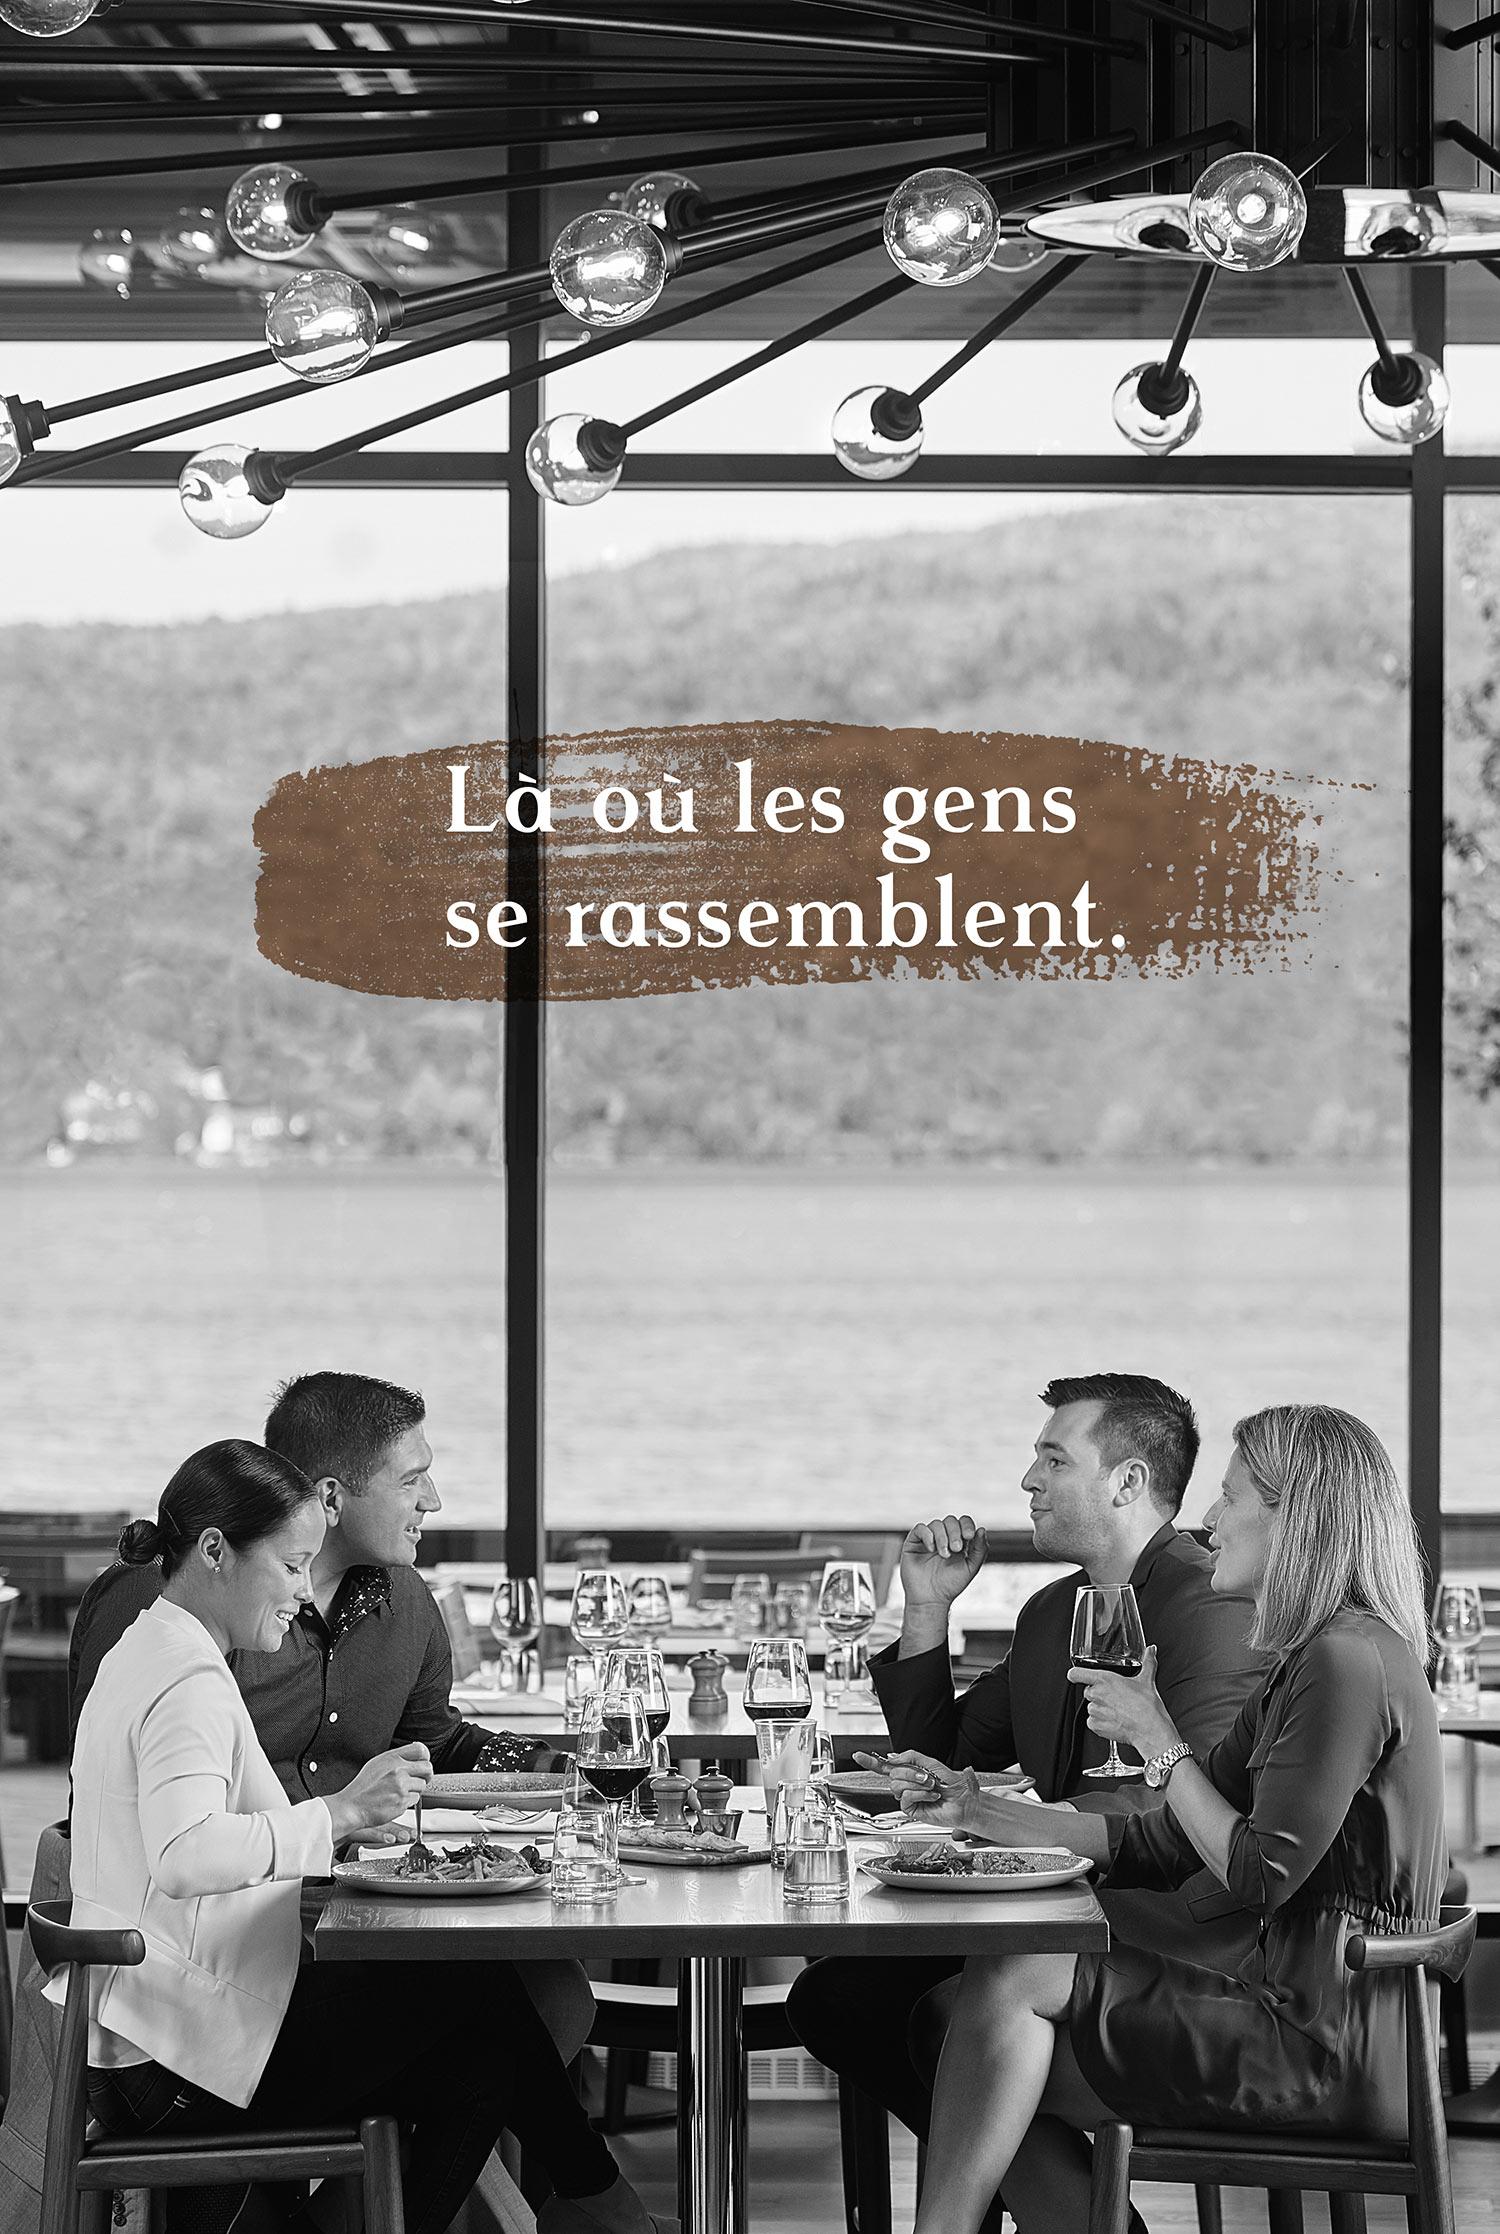 L'îlot restaurant - Là où les gens se rassemblent.